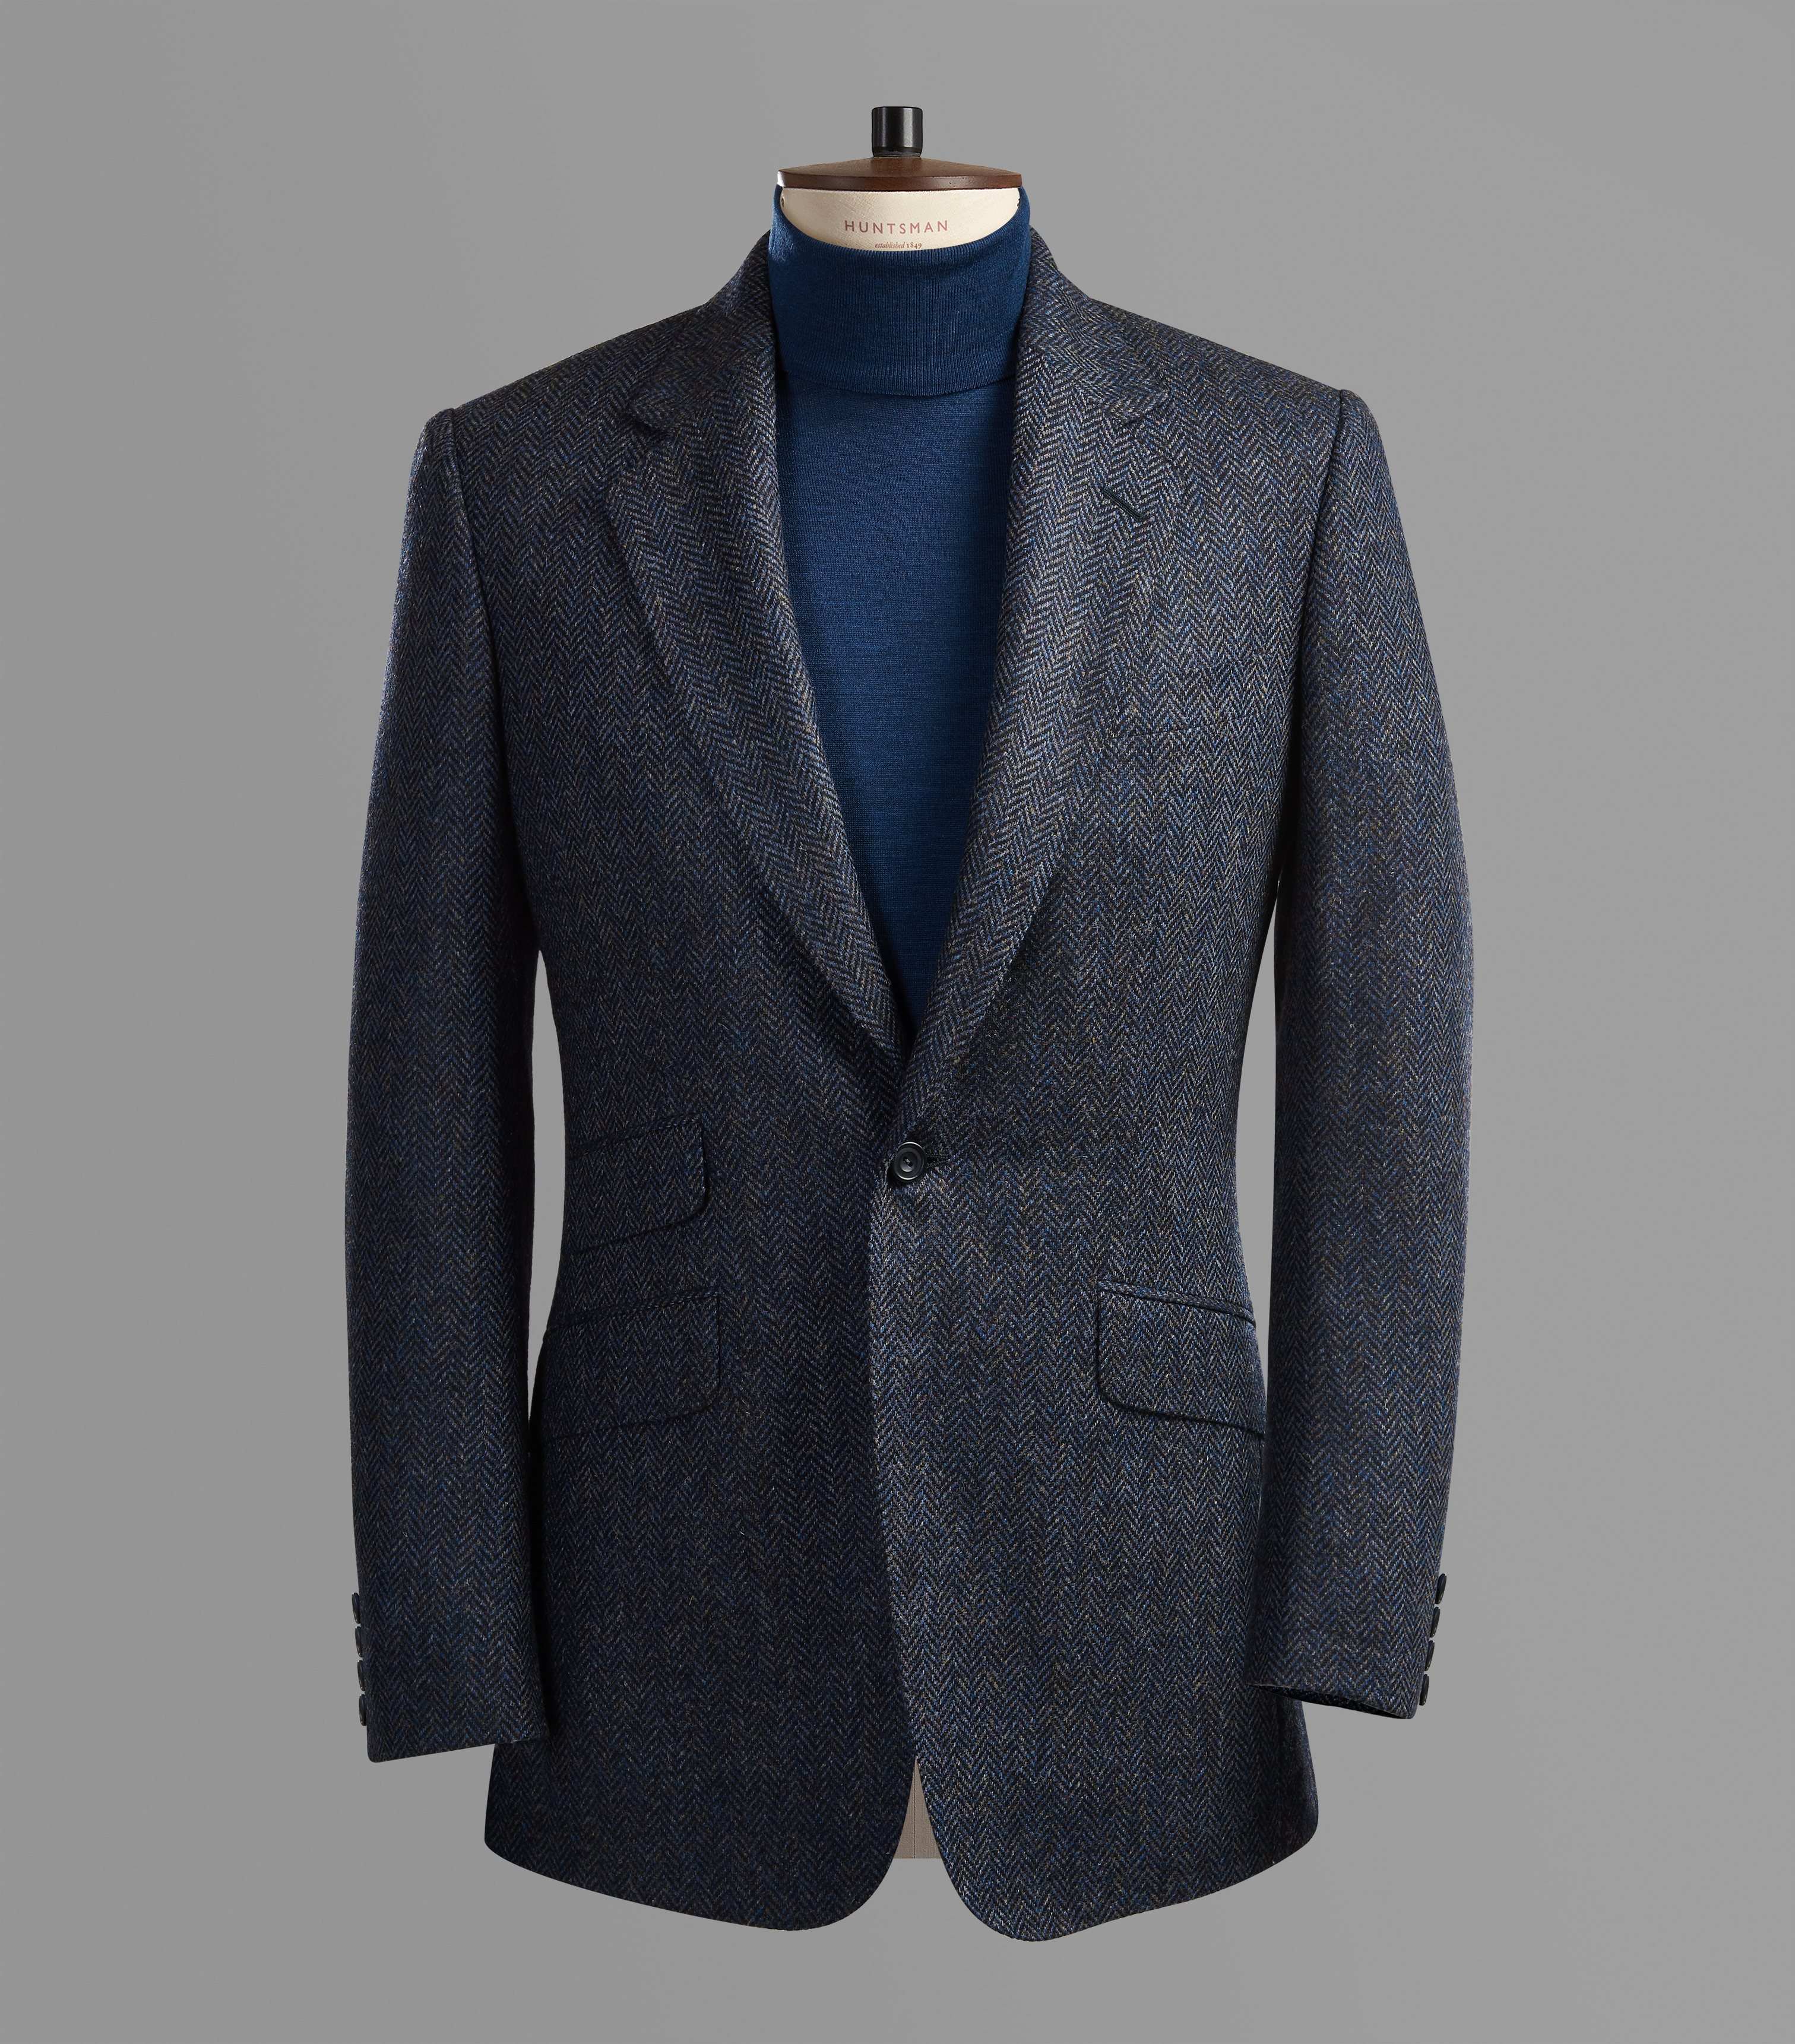 Blue Herringbone Tweed Sports Jacket Blazer